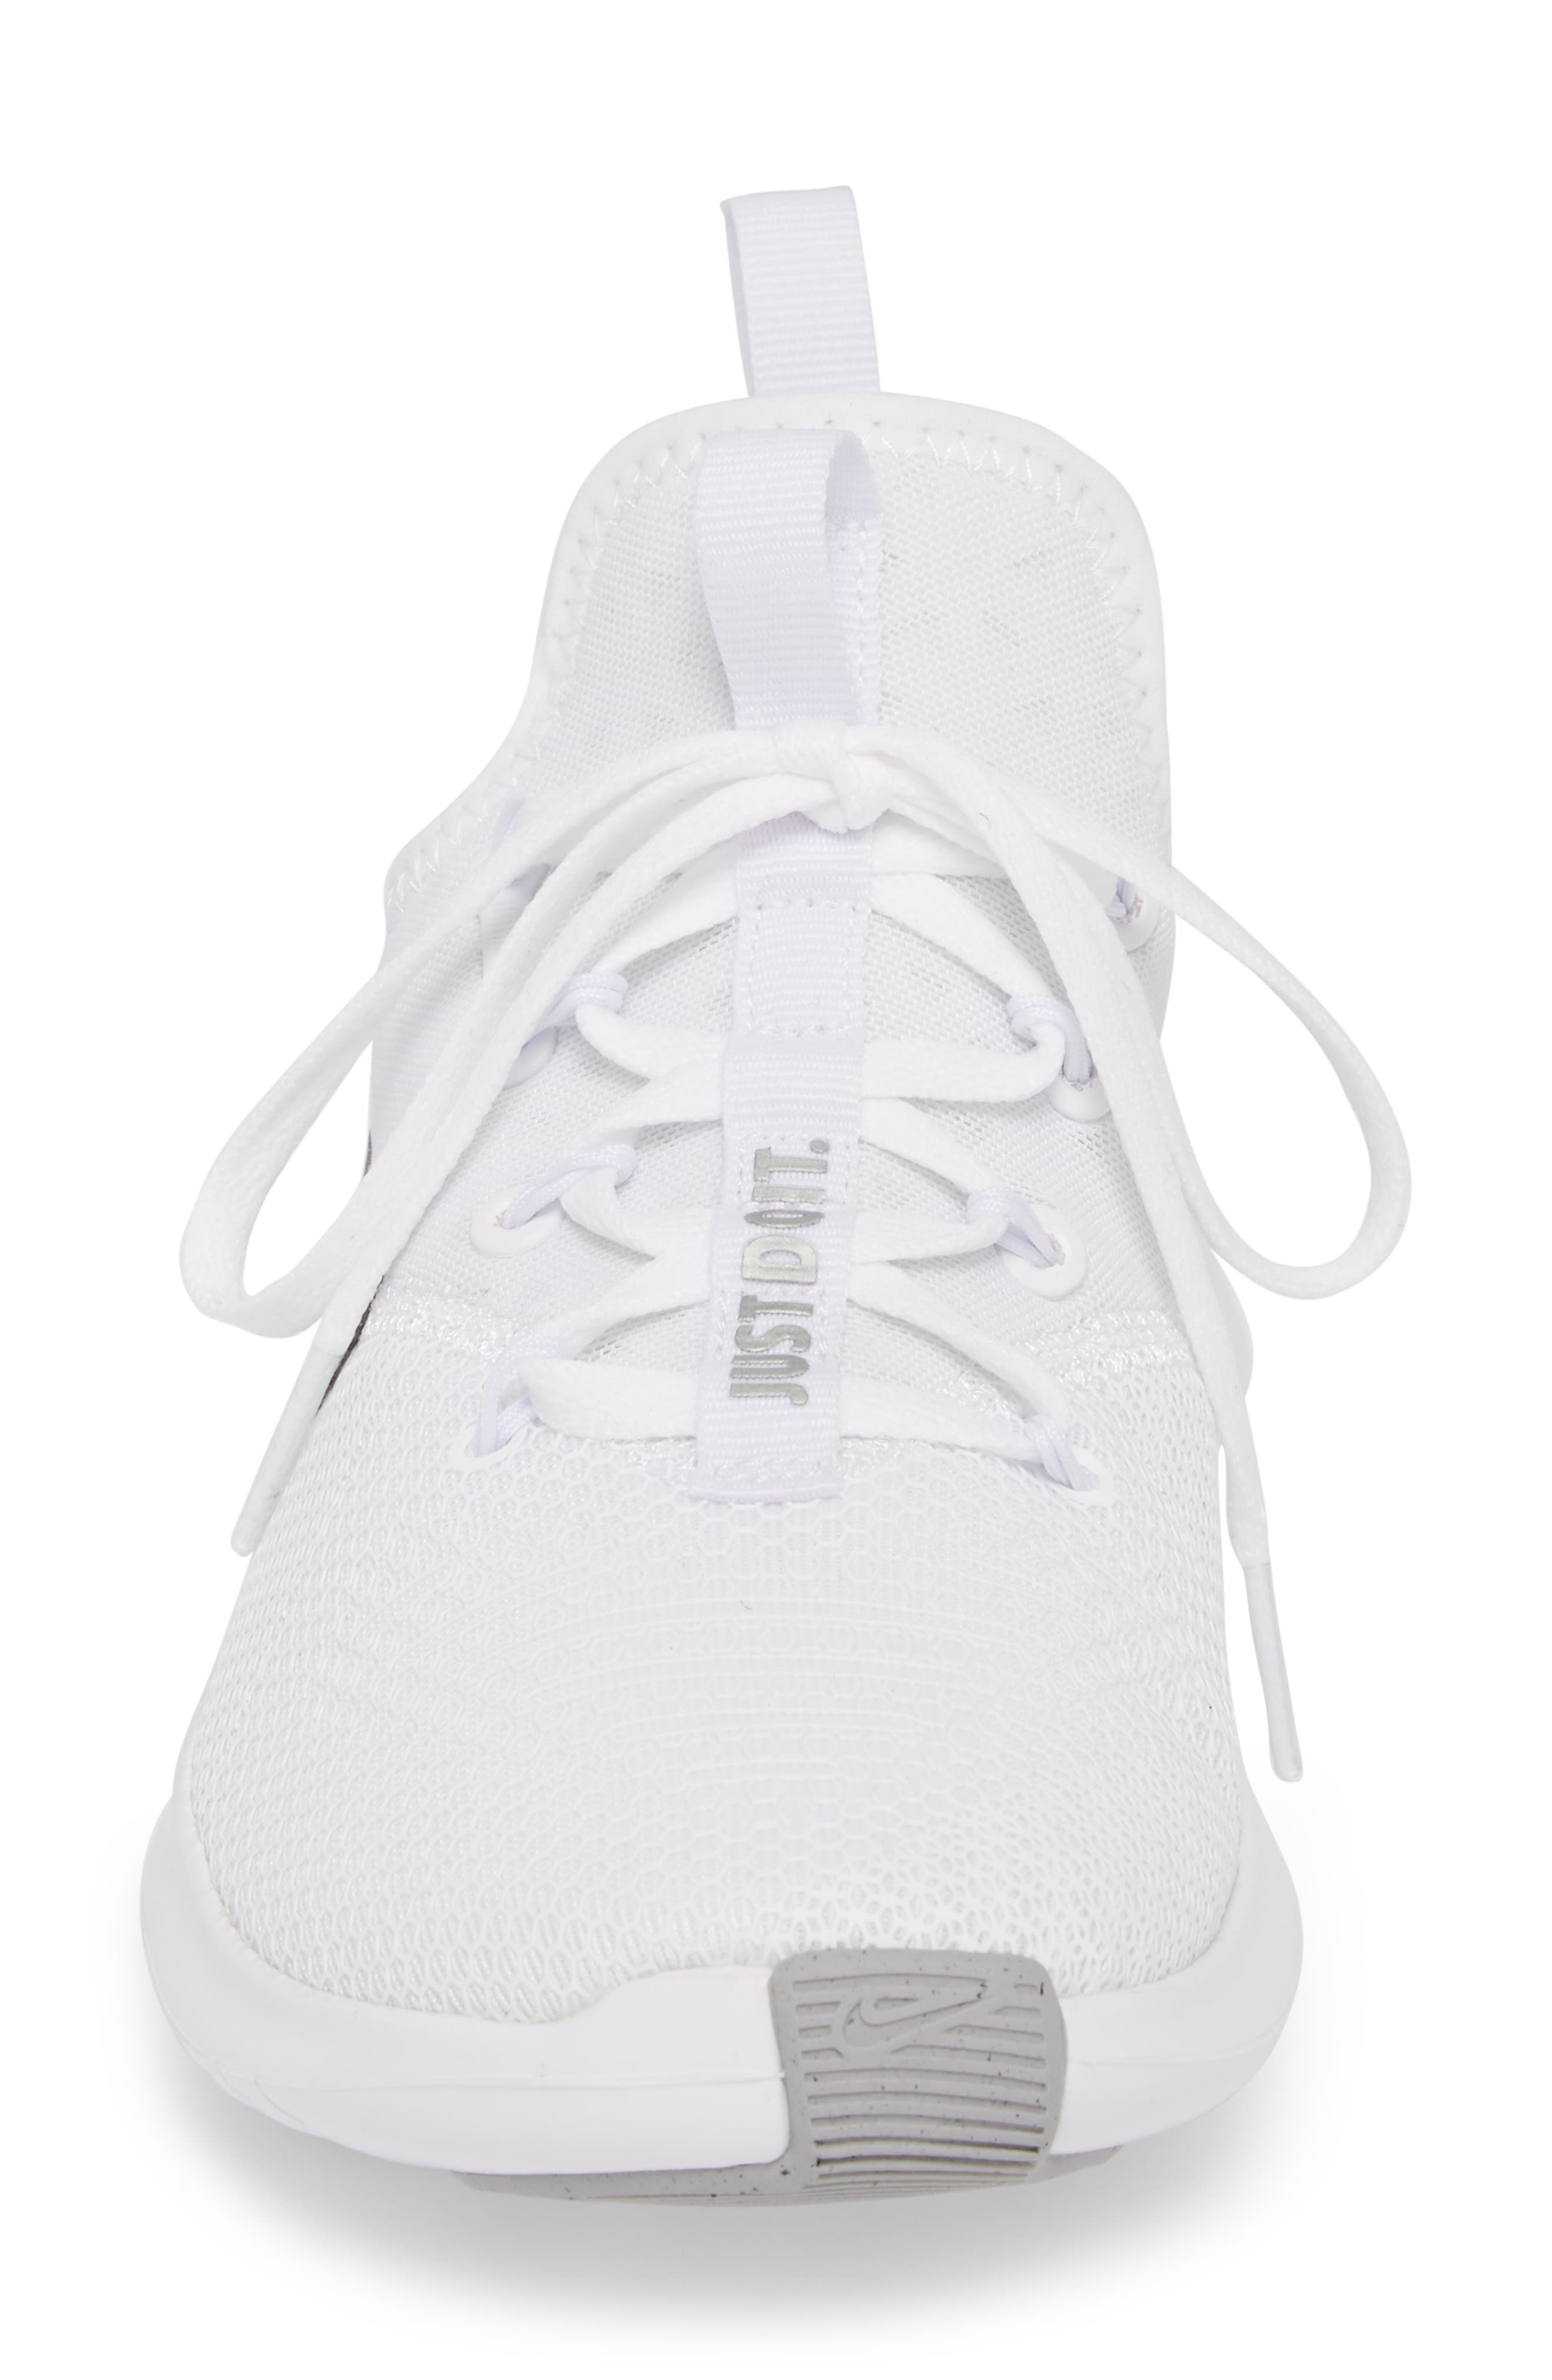 Free TR8 Training Shoe,                             Alternate thumbnail 4, color,                             White/ Metallic Silver/ White